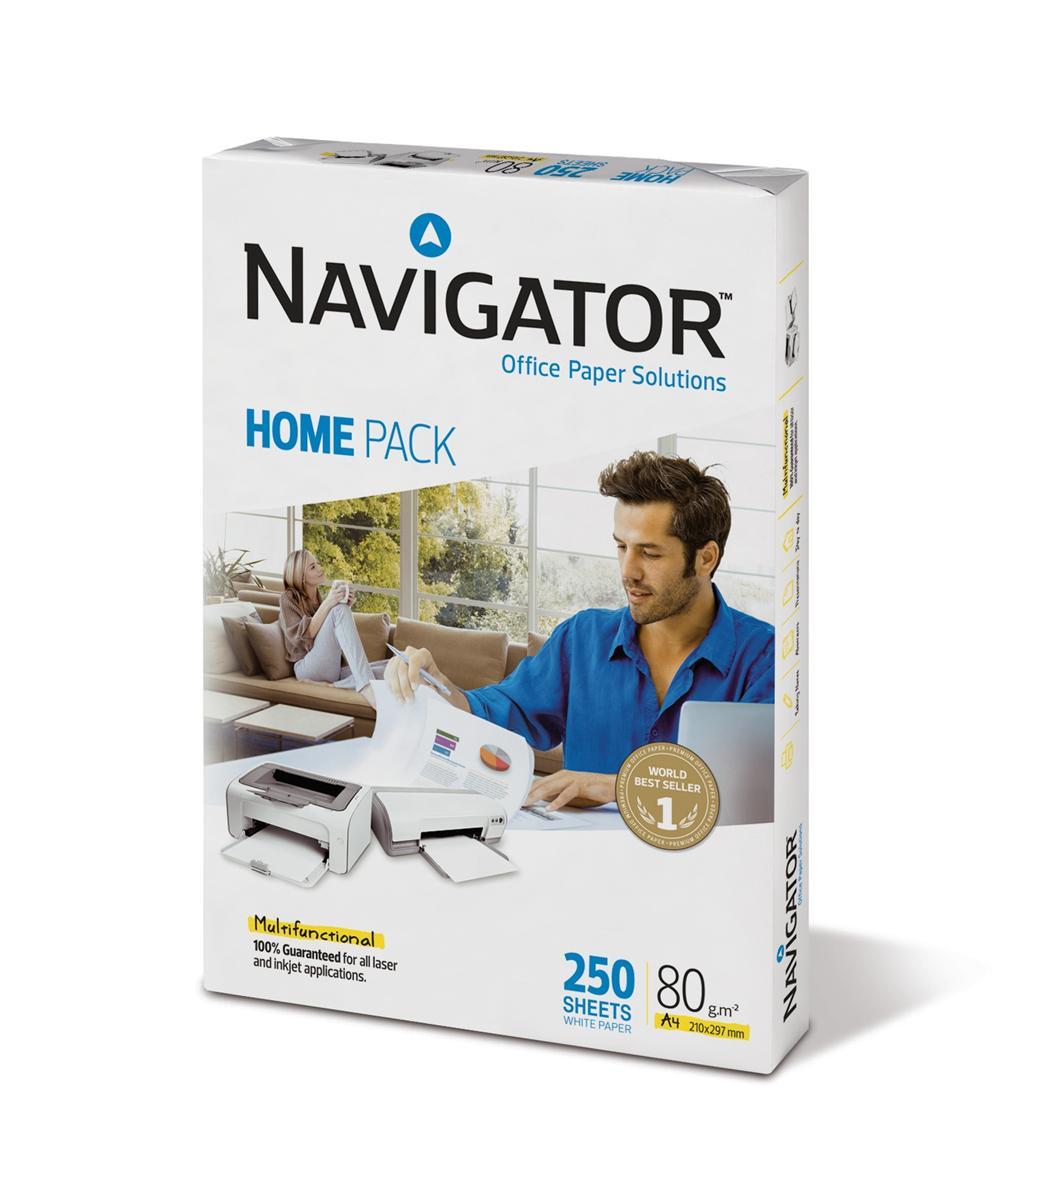 Image for Navigator Homepack 80gsm A4 250 Sheets Ref 127415